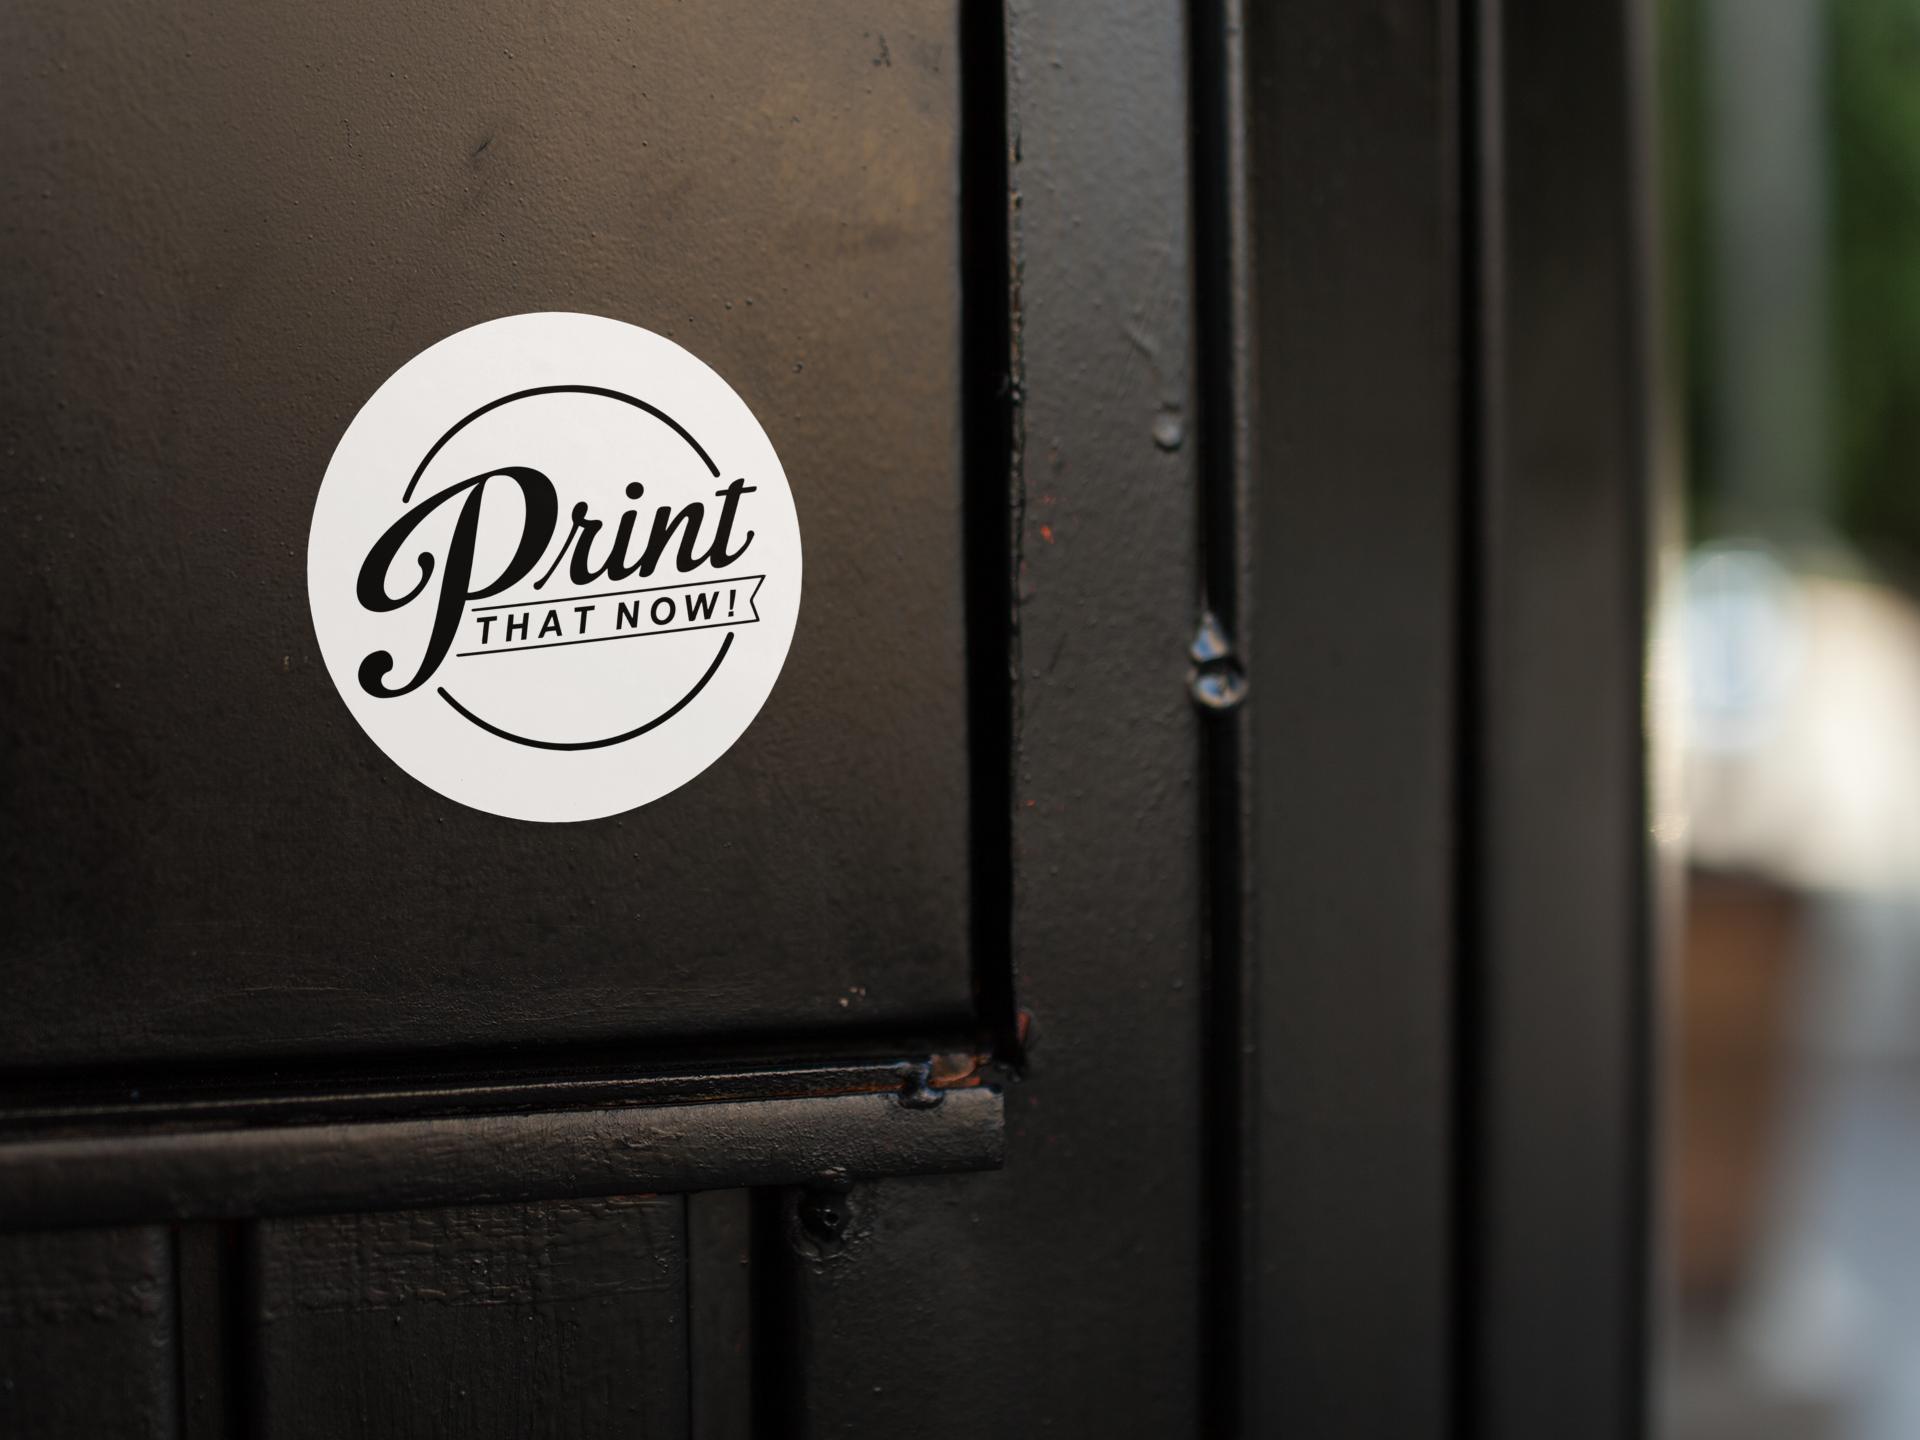 printing service SG